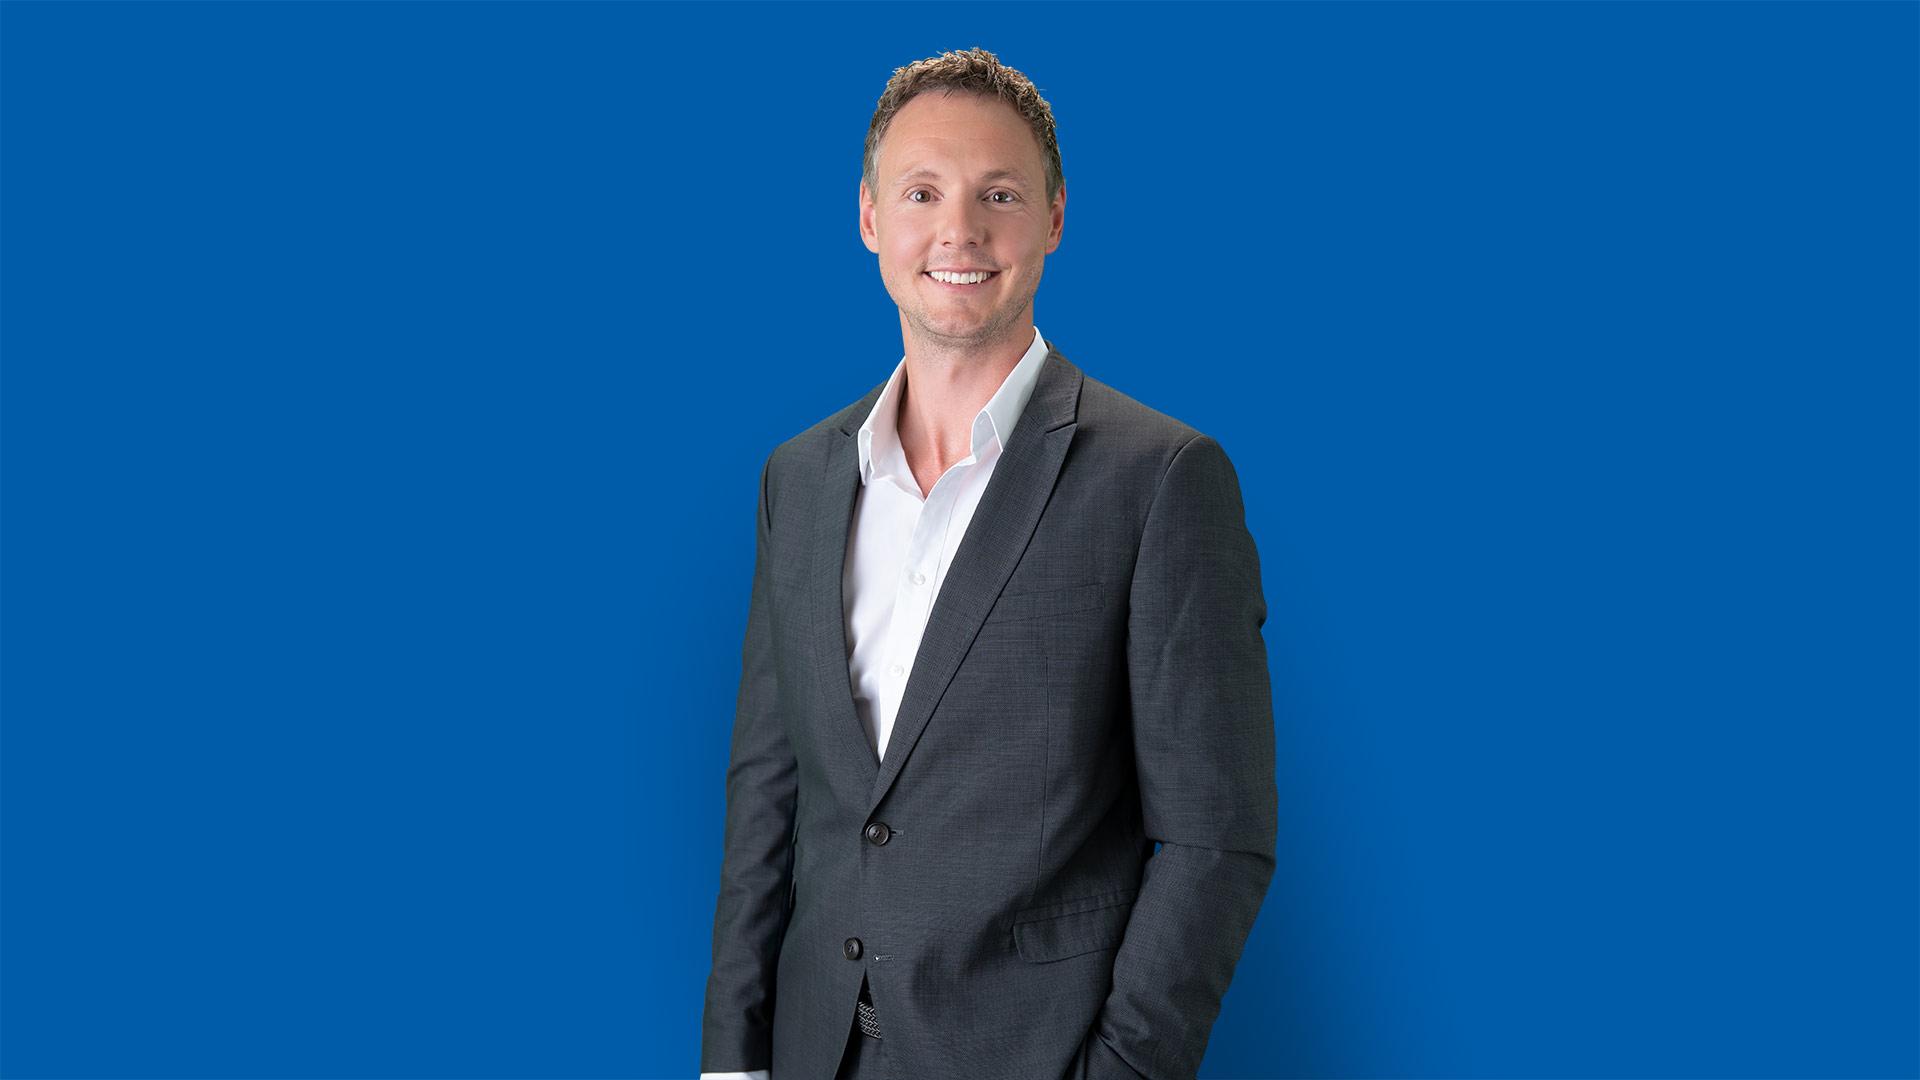 Hannes Moshammer